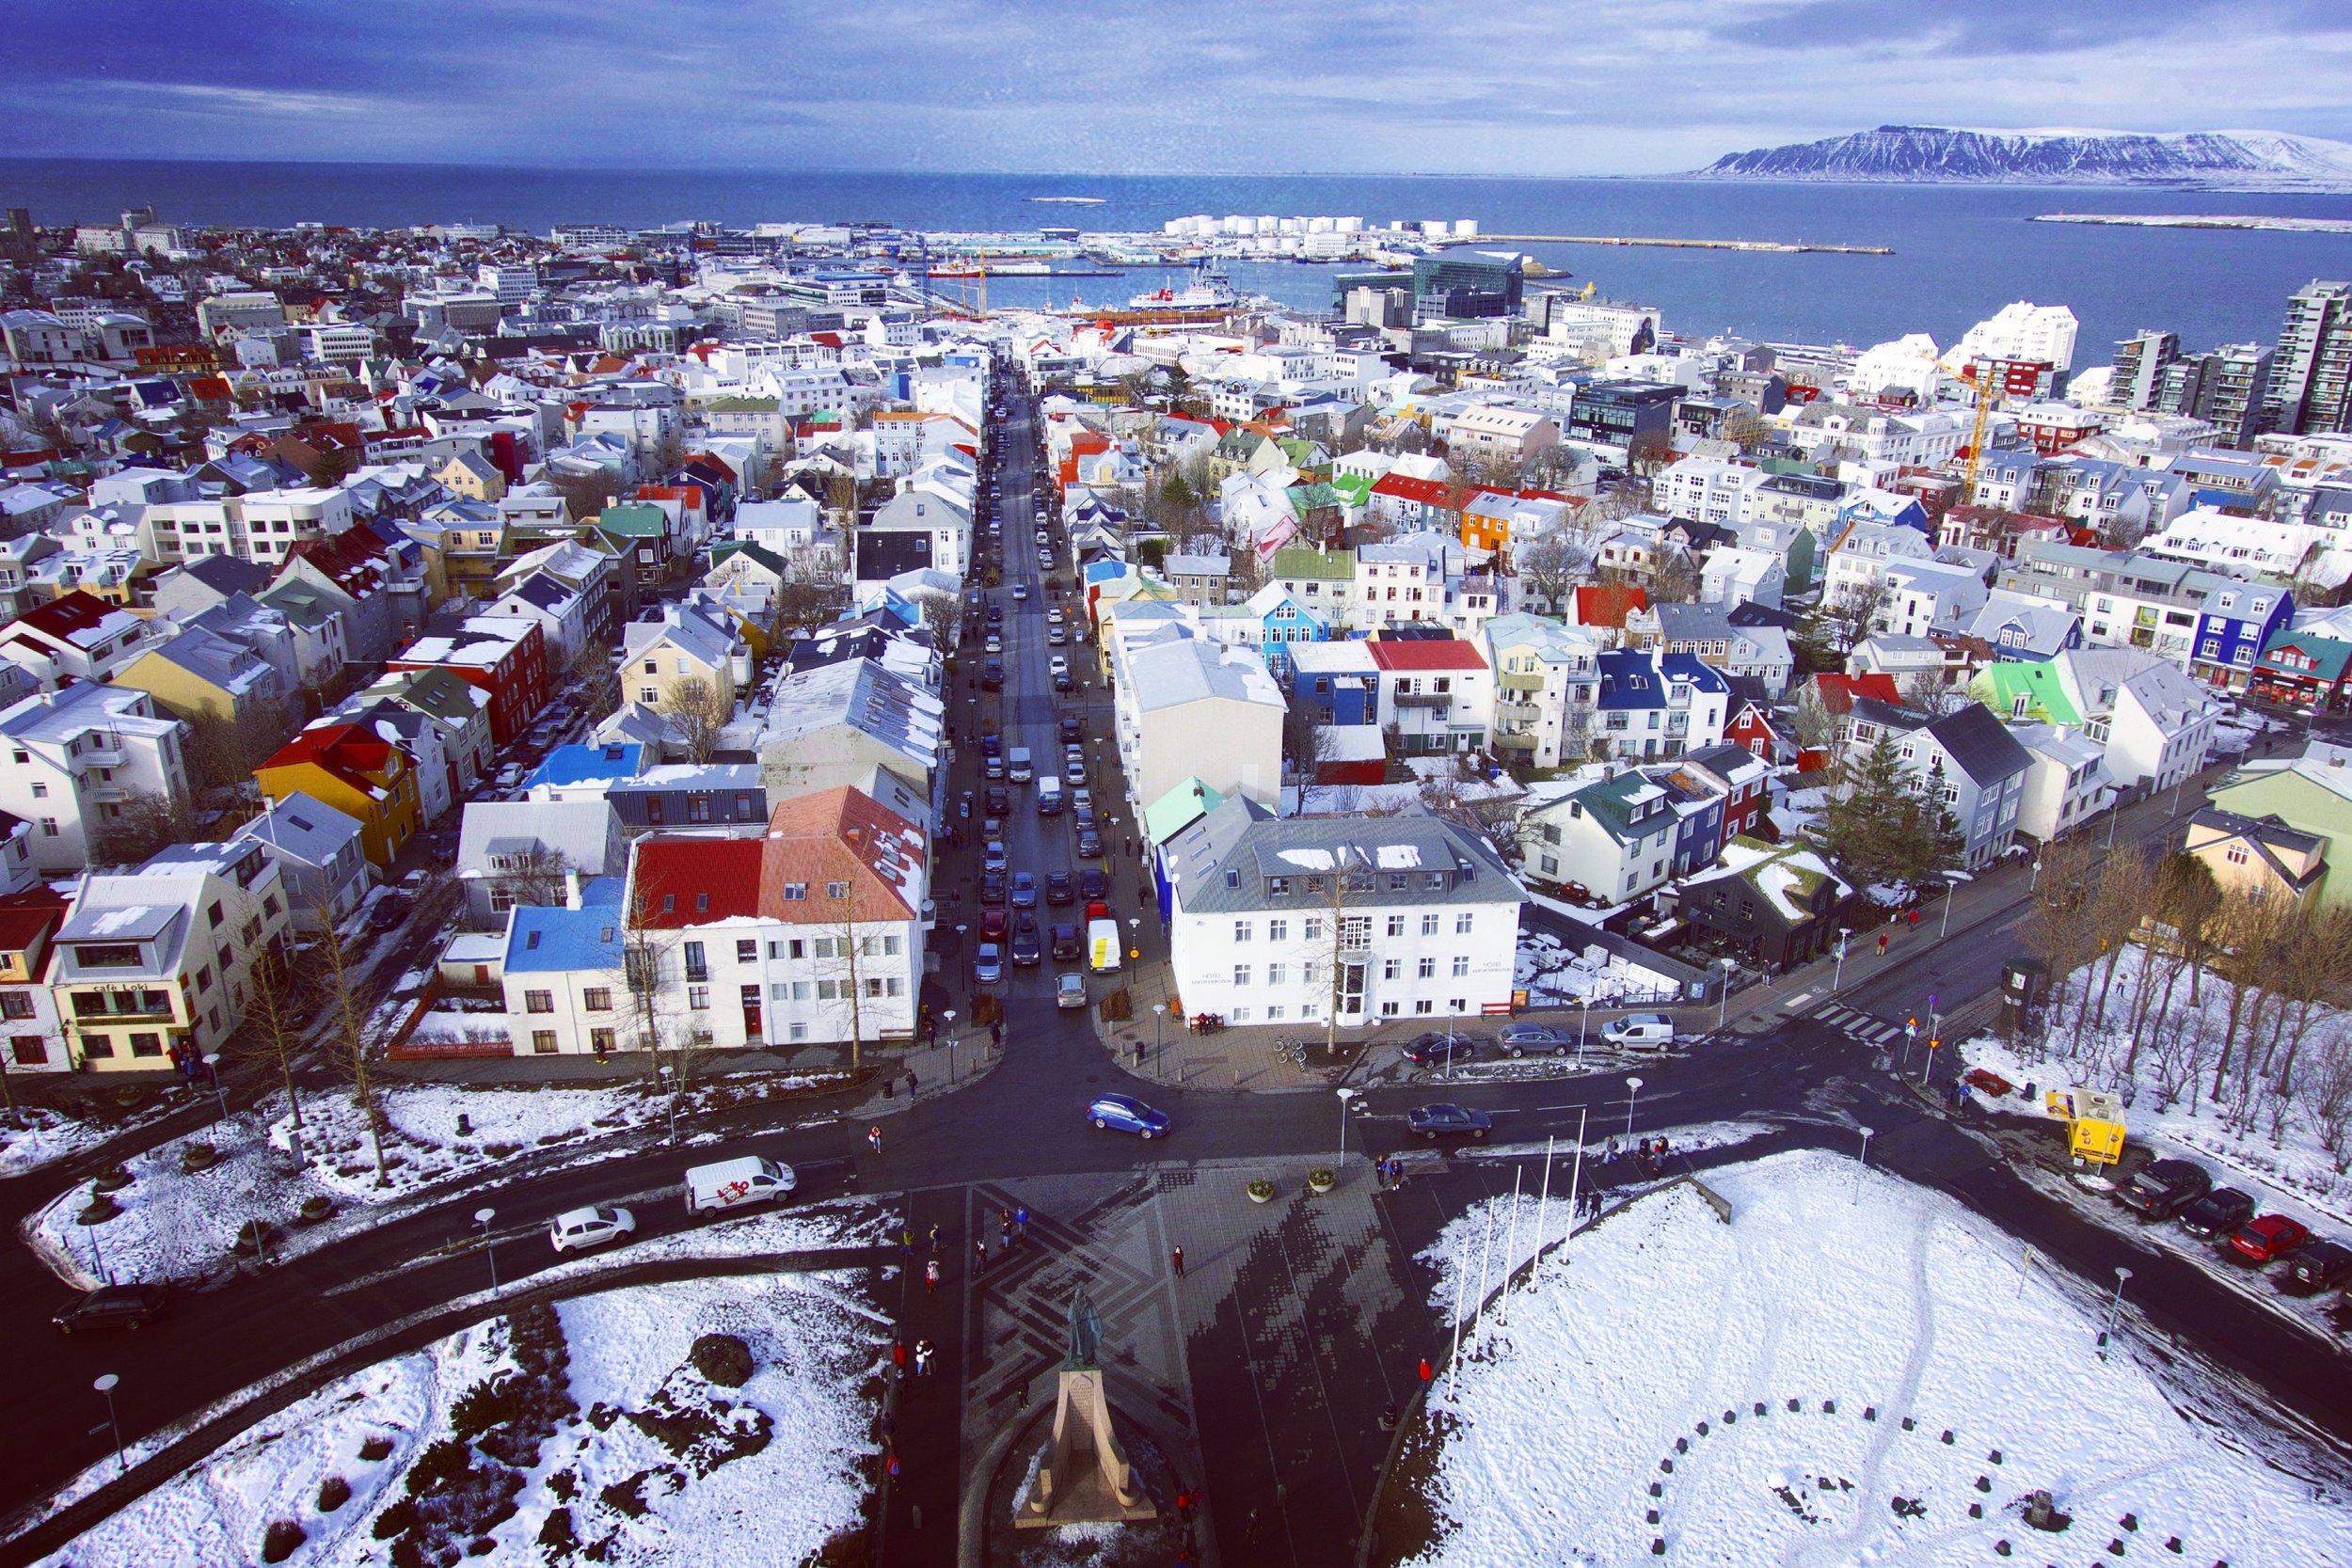 View of Reykjavík from the observation tower in  Hallgrímskirkja